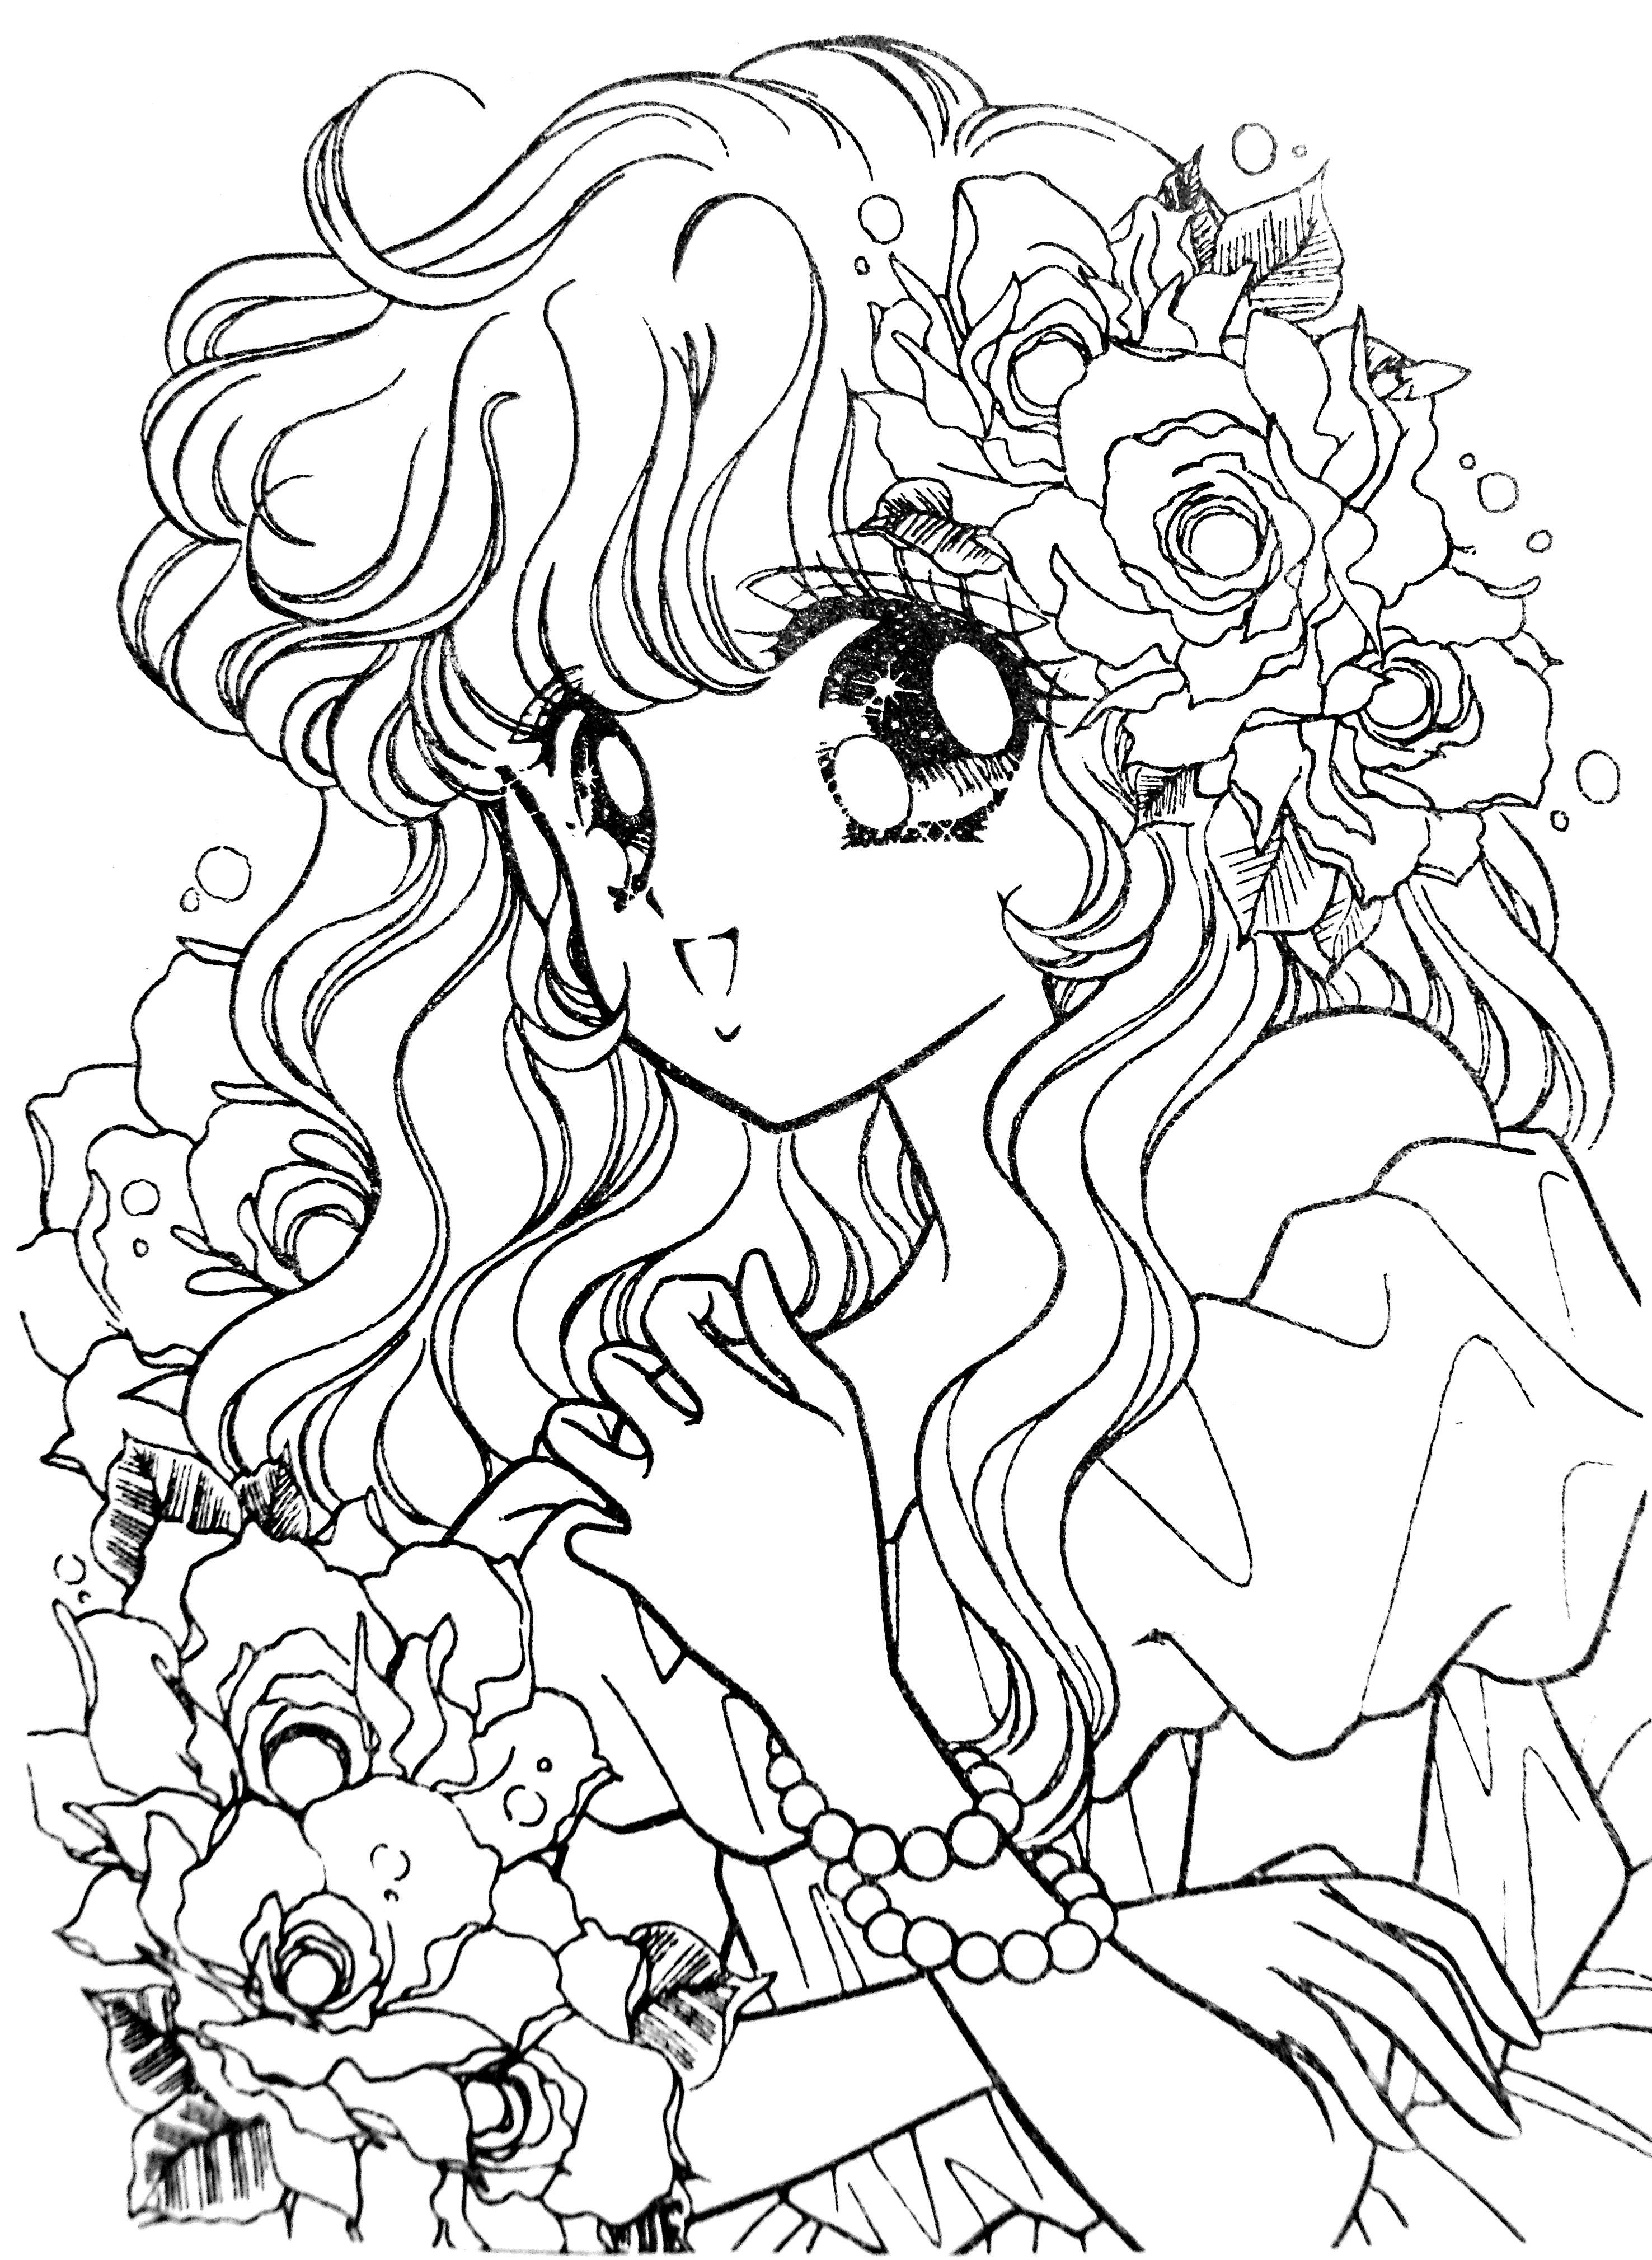 Pin de karina sarobe en anime | Pinterest | Dibujos en, Dibujo y Pintar